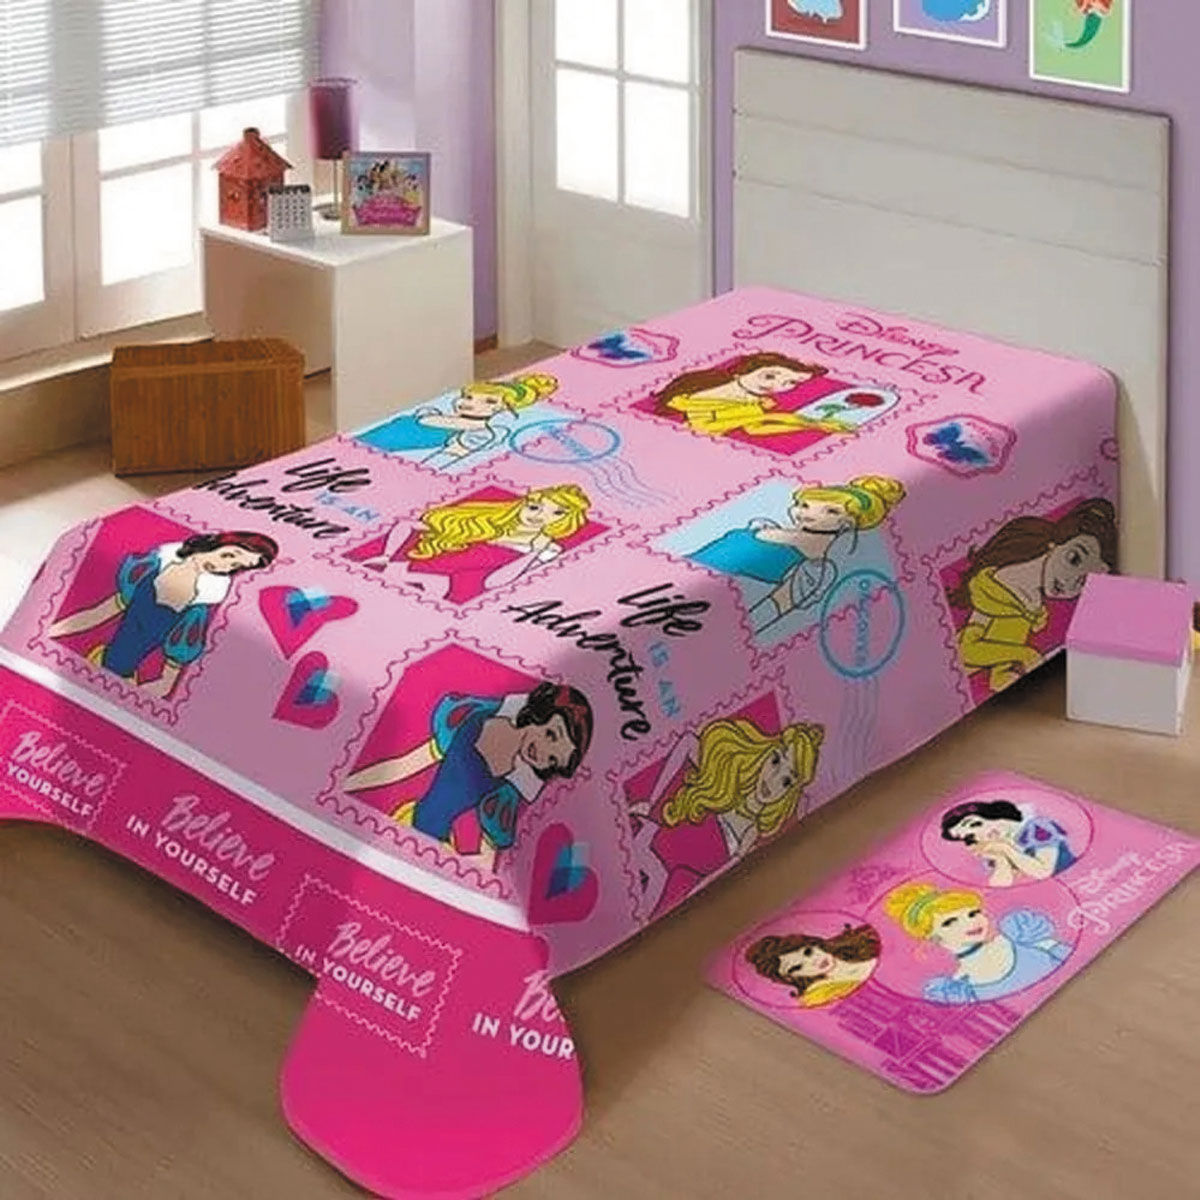 Cobertor Infantil Princesas Disney Manta Fleece Microfibra Soft Jolitex